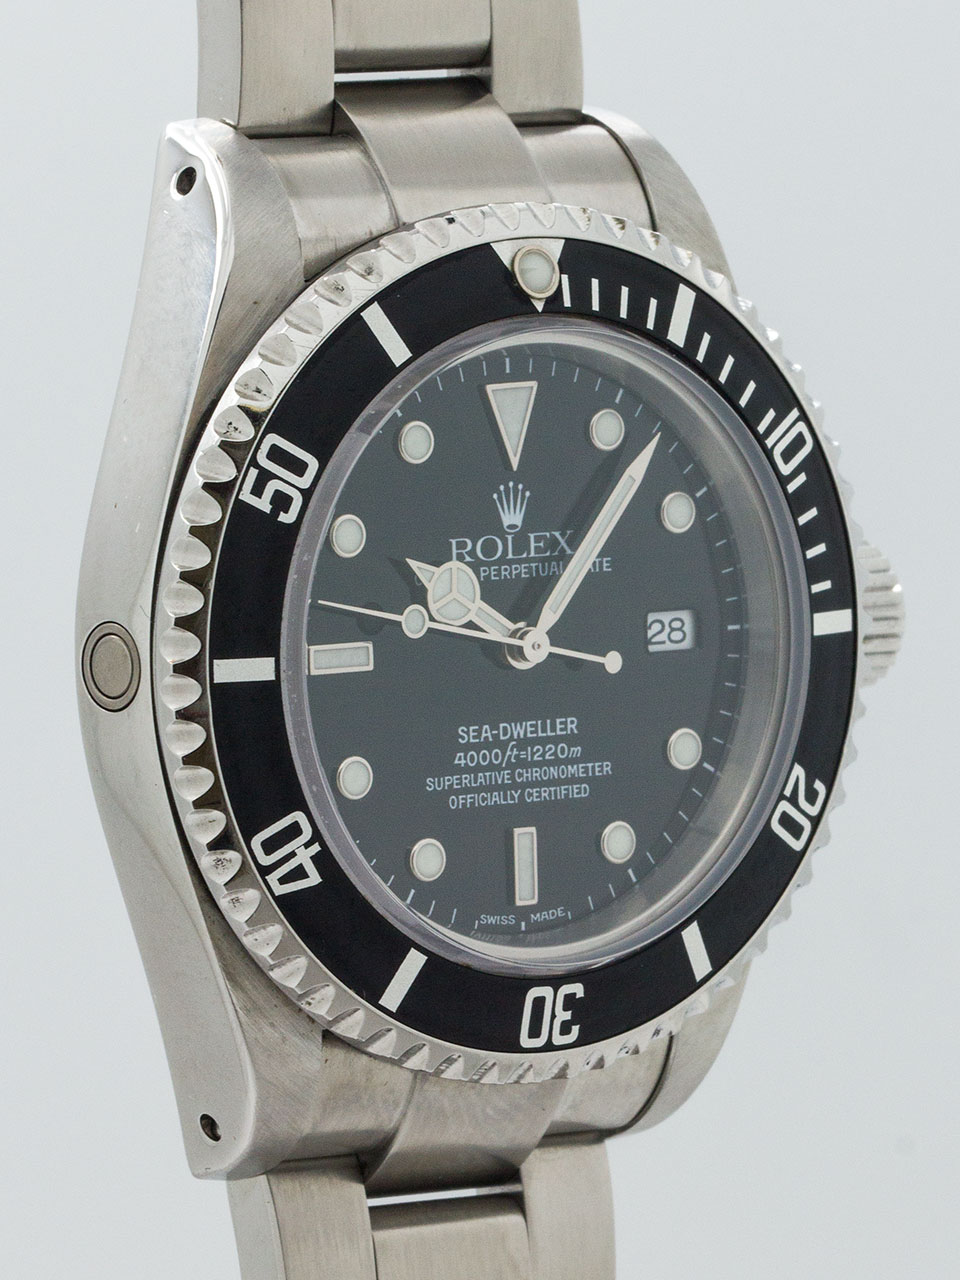 Rolex Sea-Dweller ref 16600 circa 2000